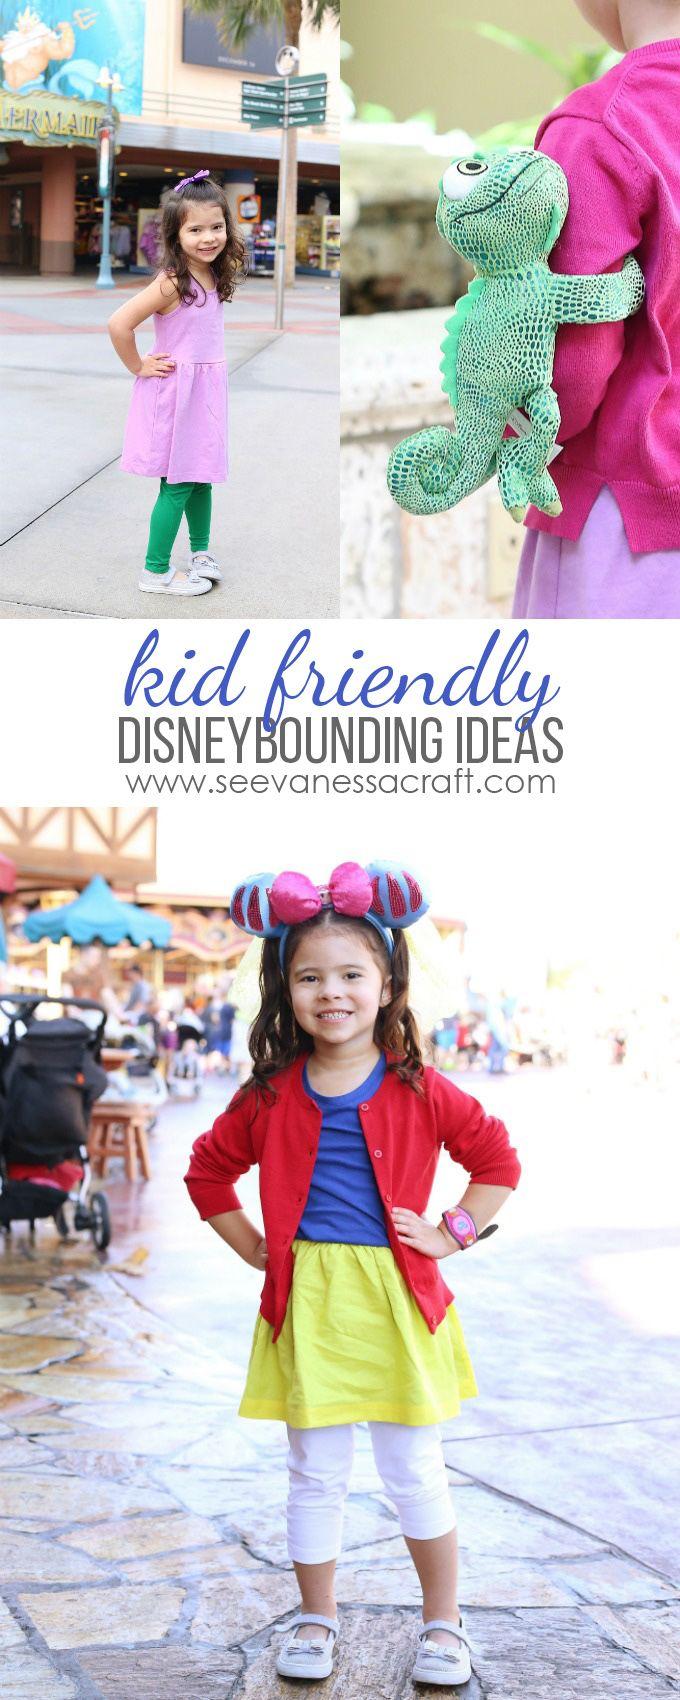 Disney World Disneybounding Ideas for Kids #DisneySMMC